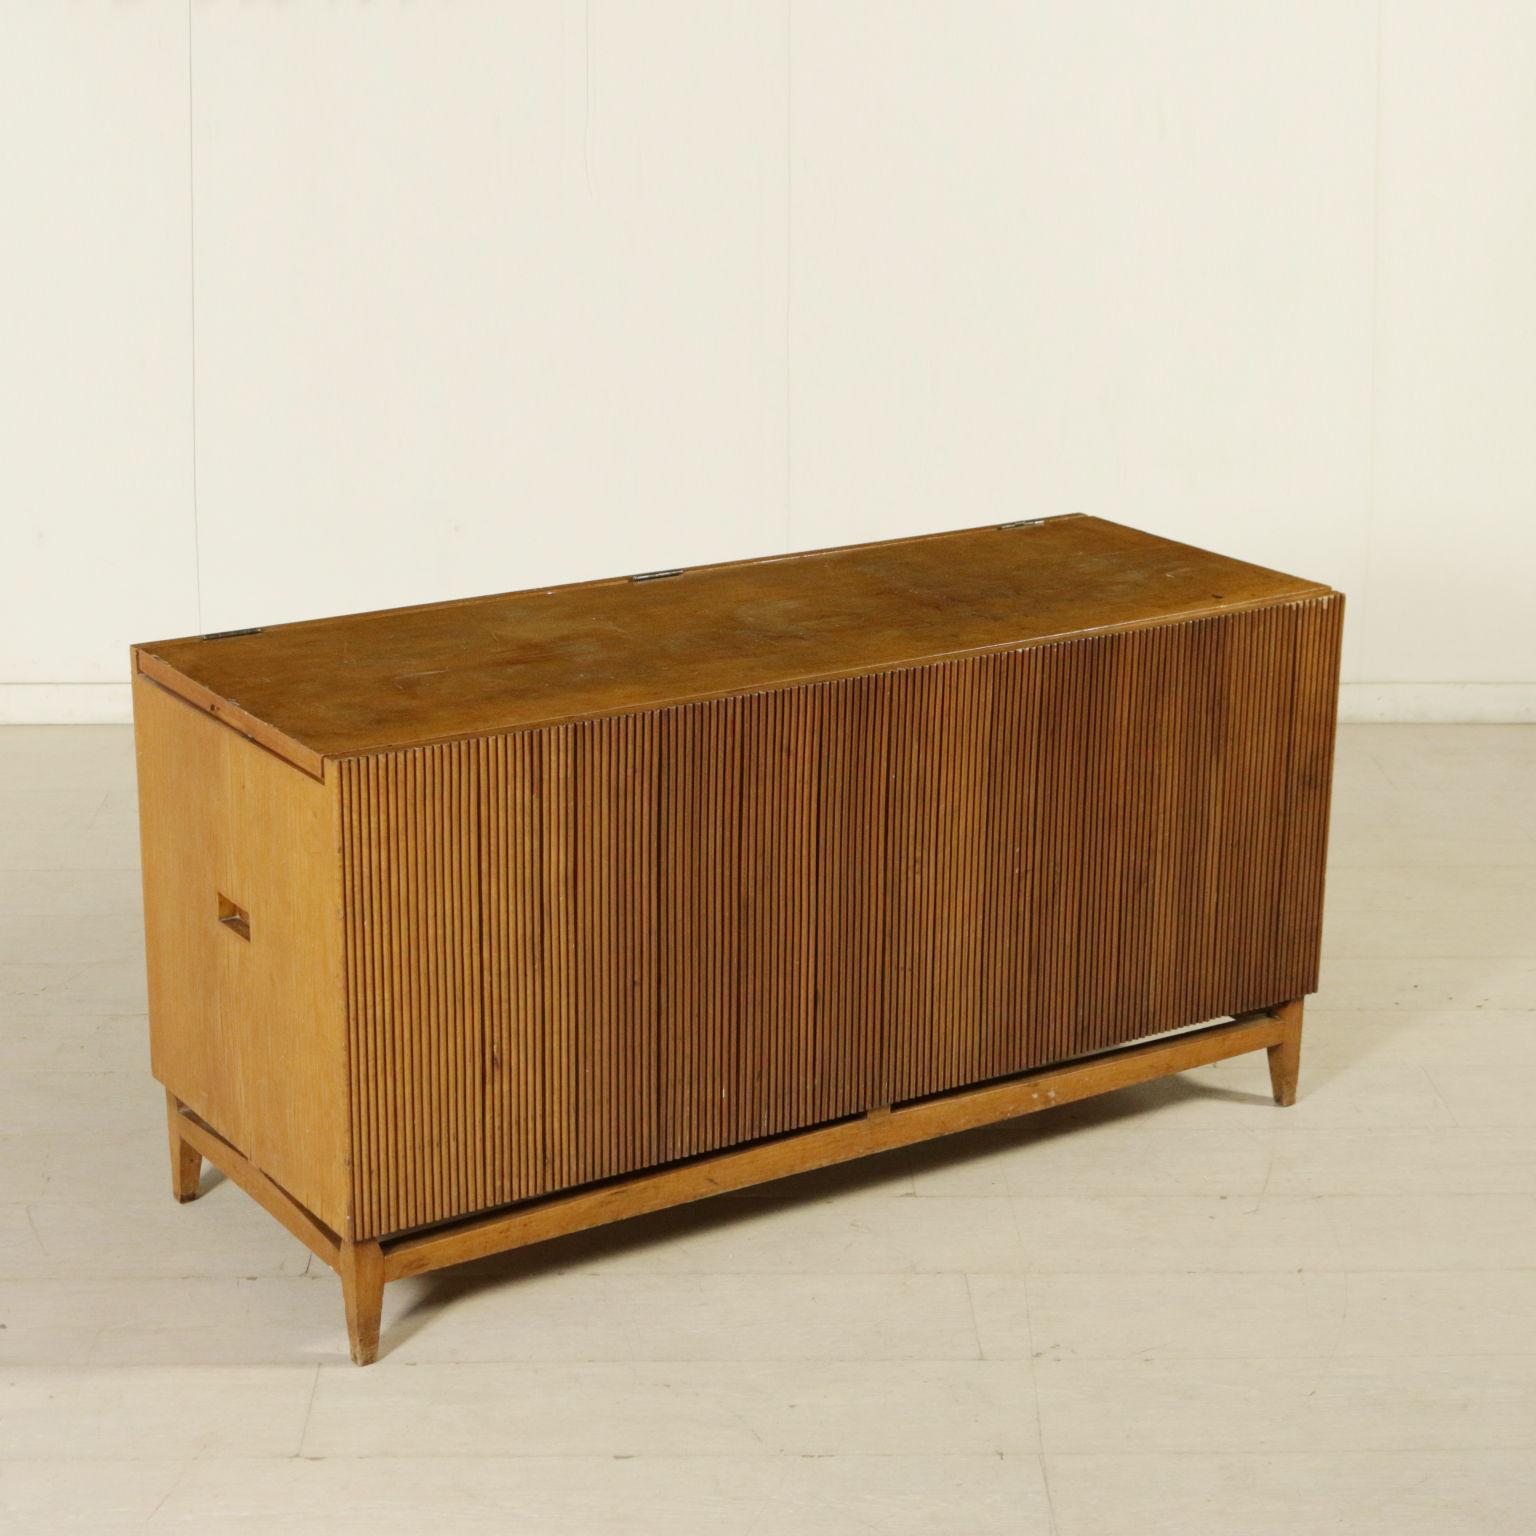 cassapanca anni 50 60 mobilio modernariato ForCassapanca Anni 50